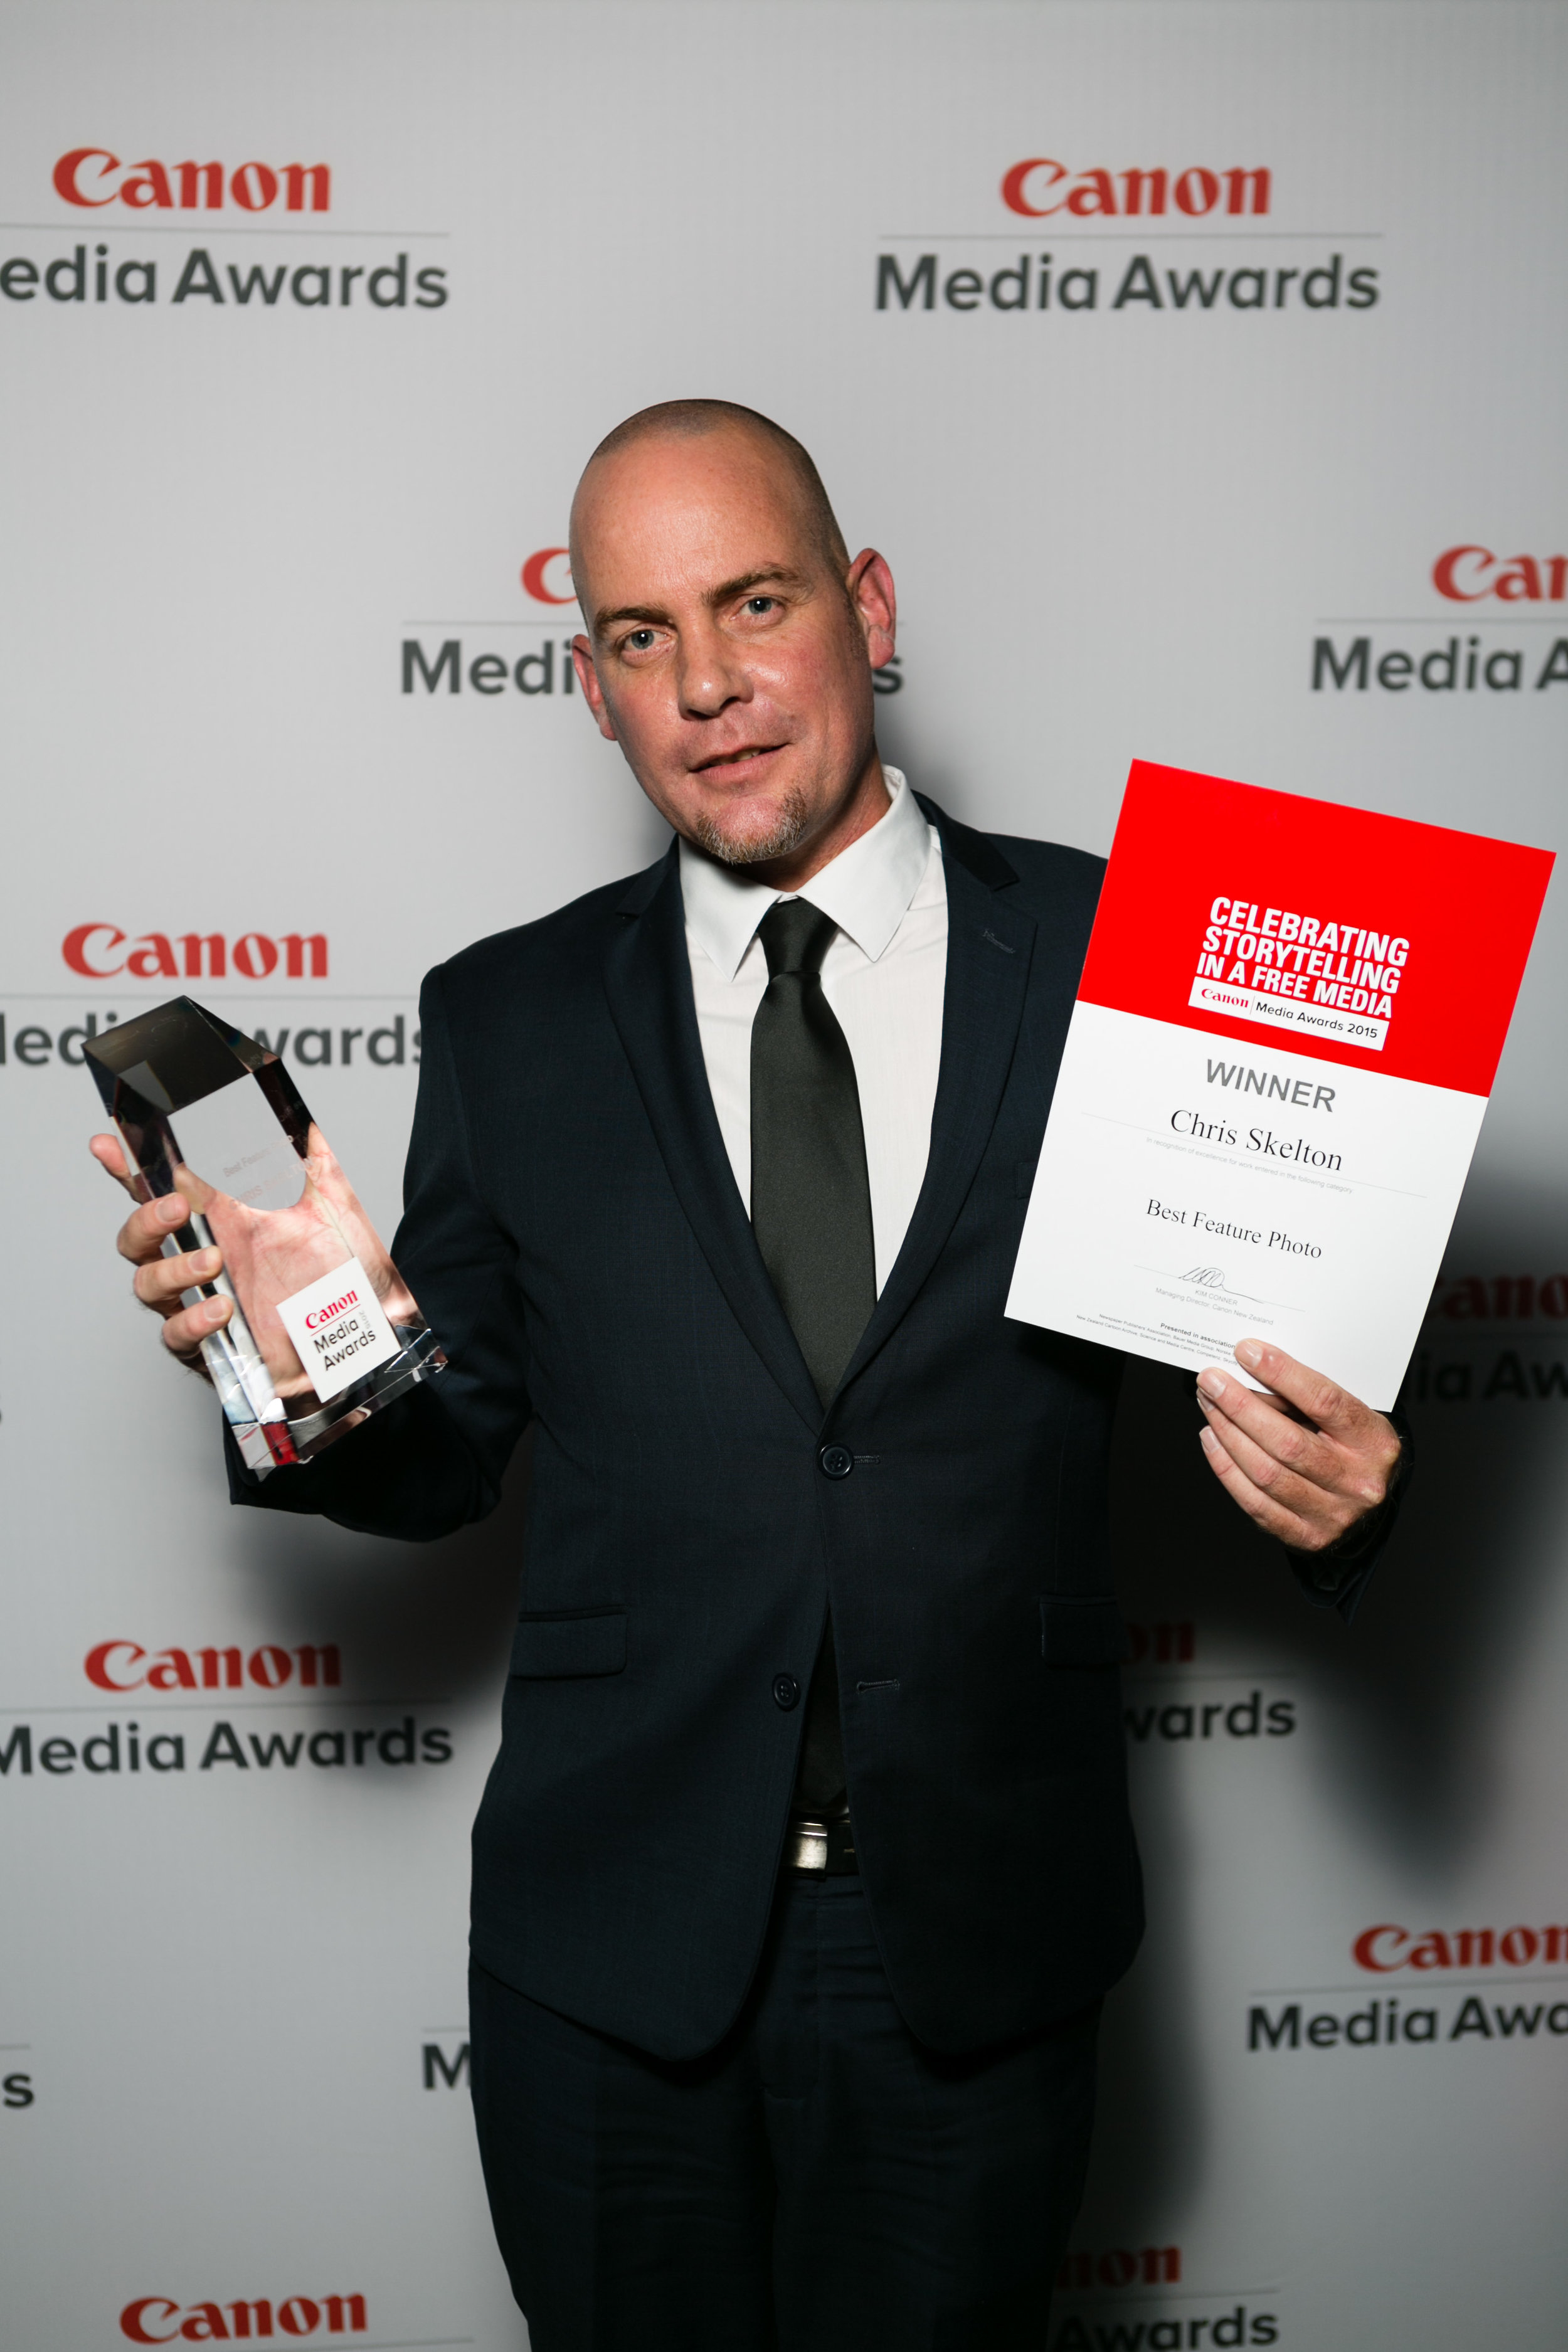 canon_media_awards_2015_interlike_nz_clinton_tudor-5973-206.jpg